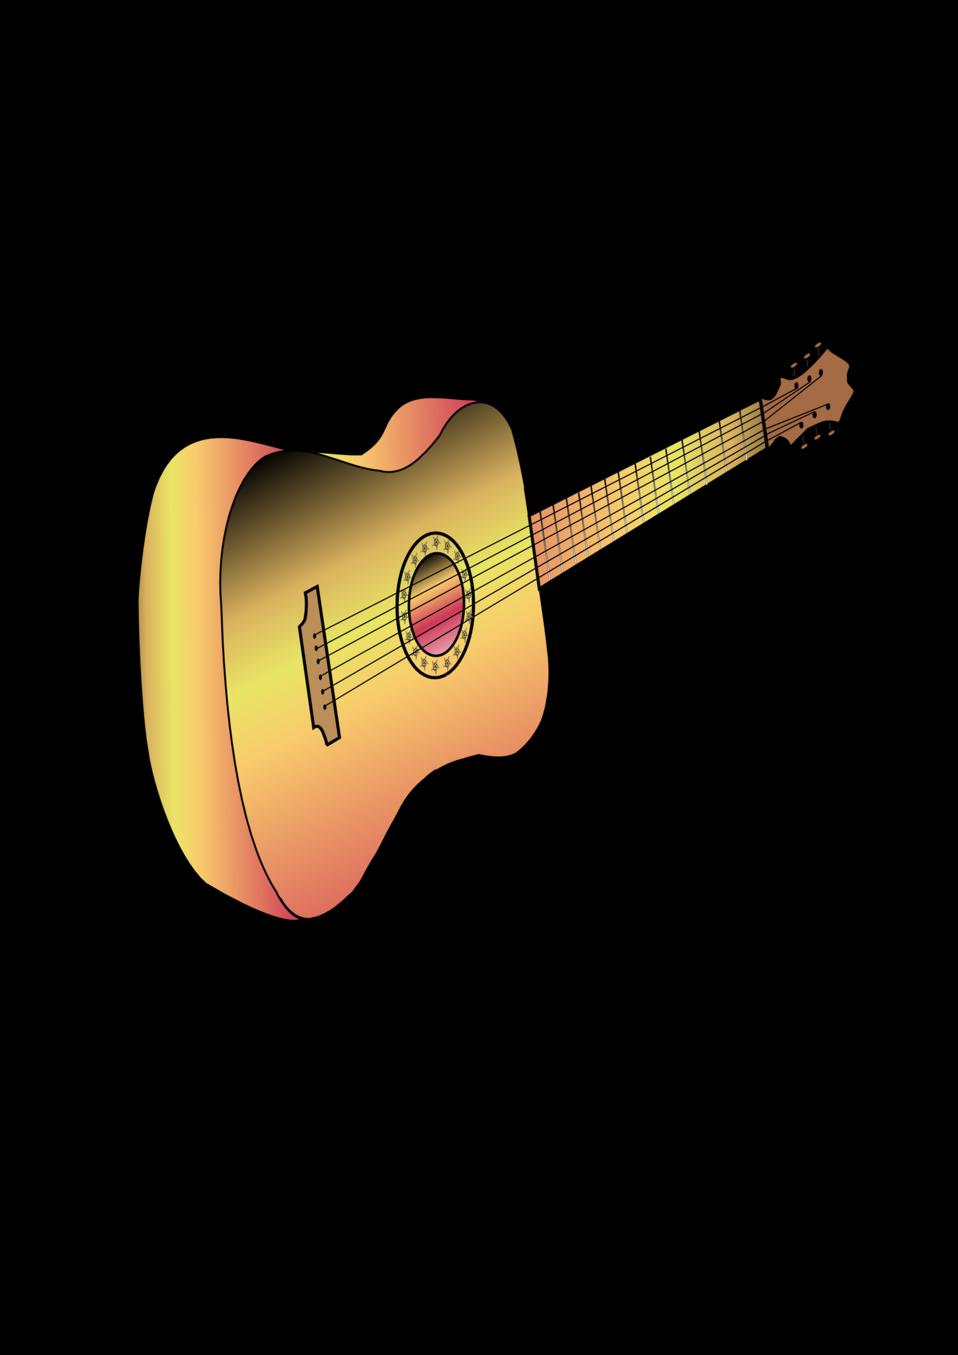 Gibson flying v clip. Clipart guitar cuatro